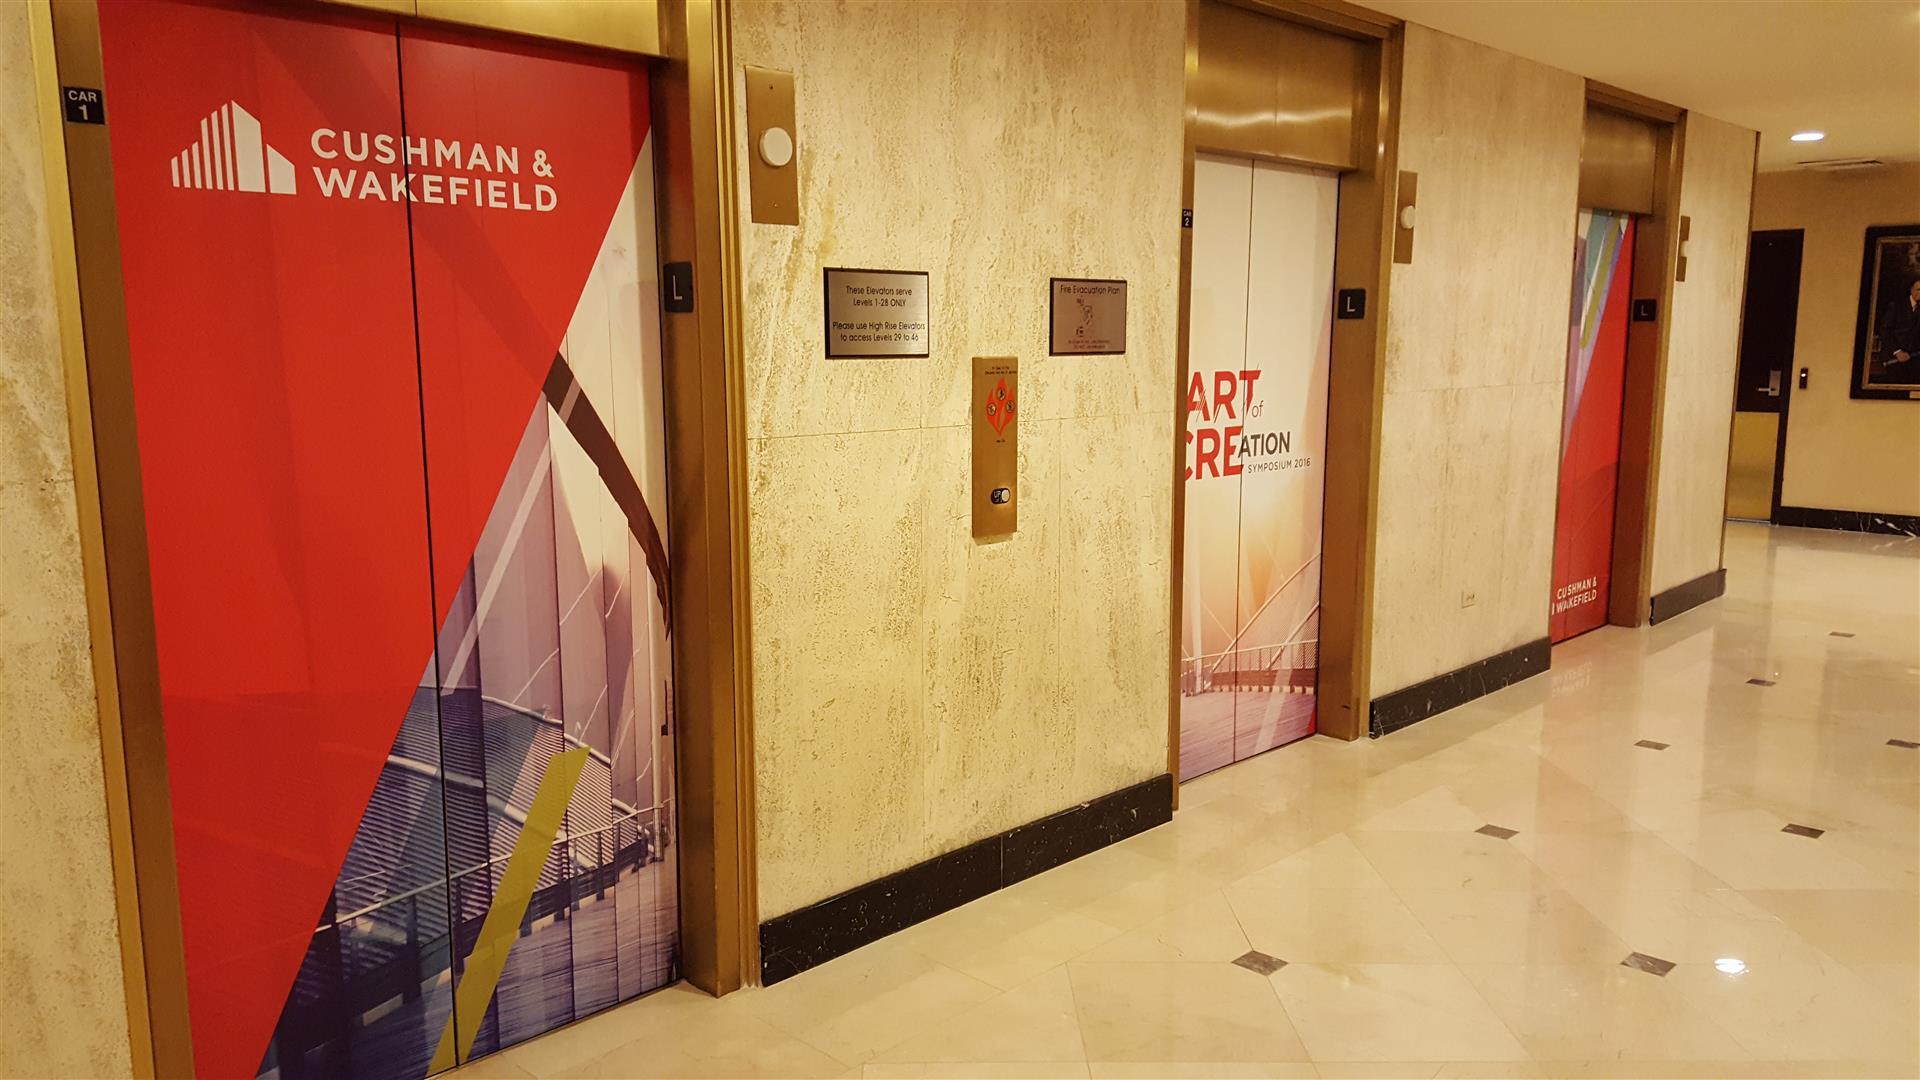 Cushman & Wakefield Elevator Signs